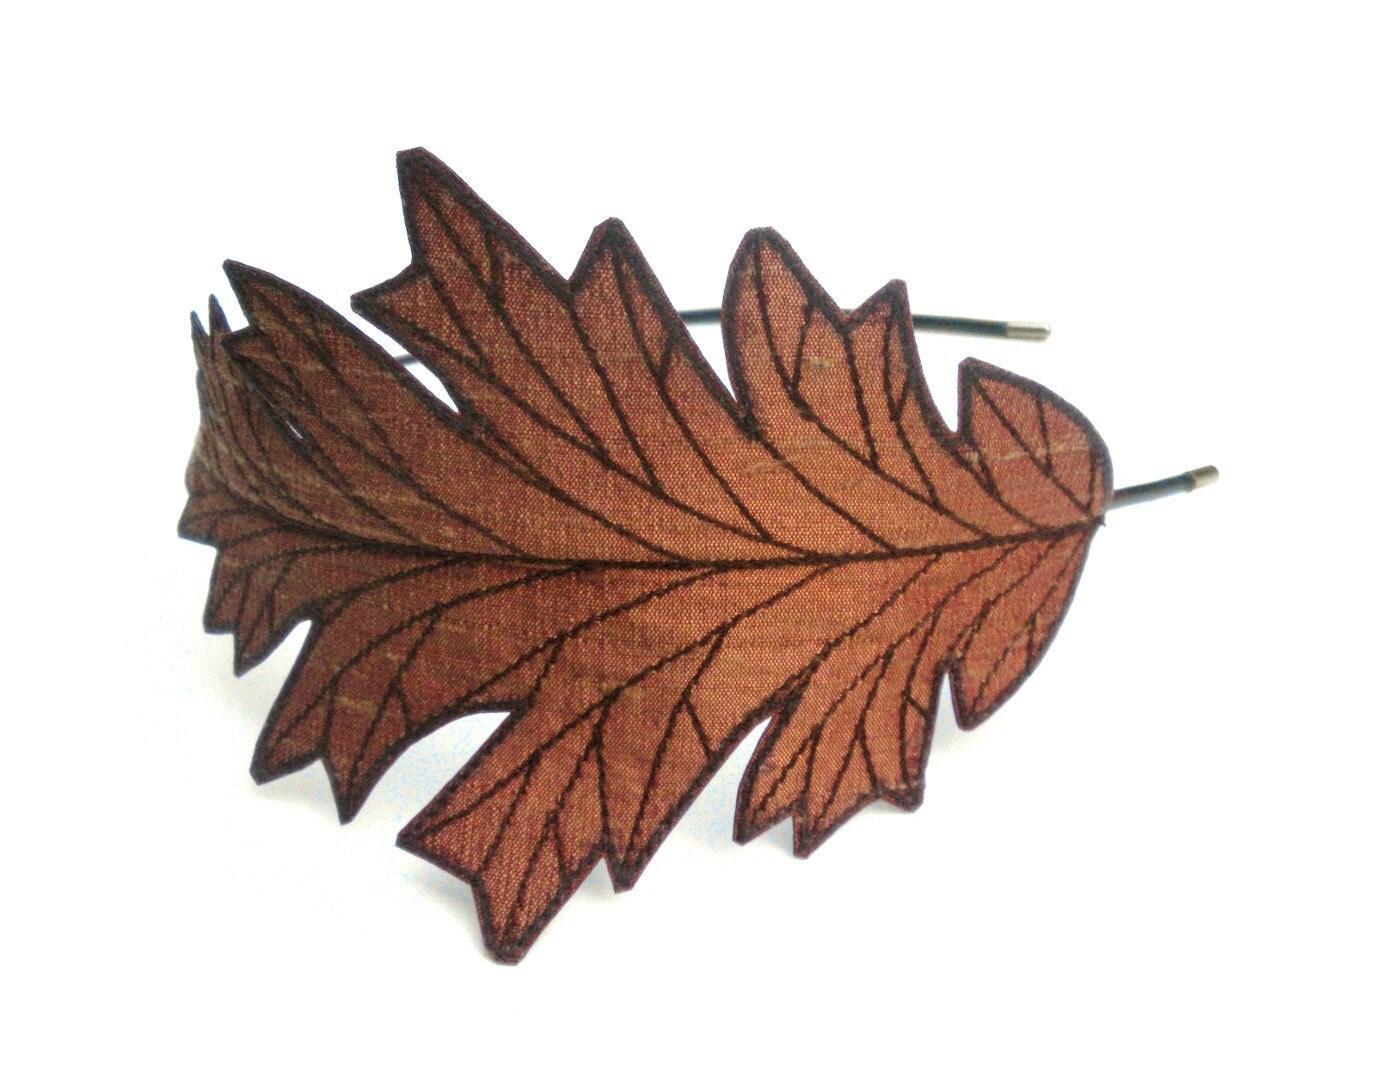 Oak Leaf Headband- Unique Embroidered Silk Fabric Leaf Headband- Cinnamon Spice with Auburn / Reddish Brown Embroidery - TheFaerieMarket